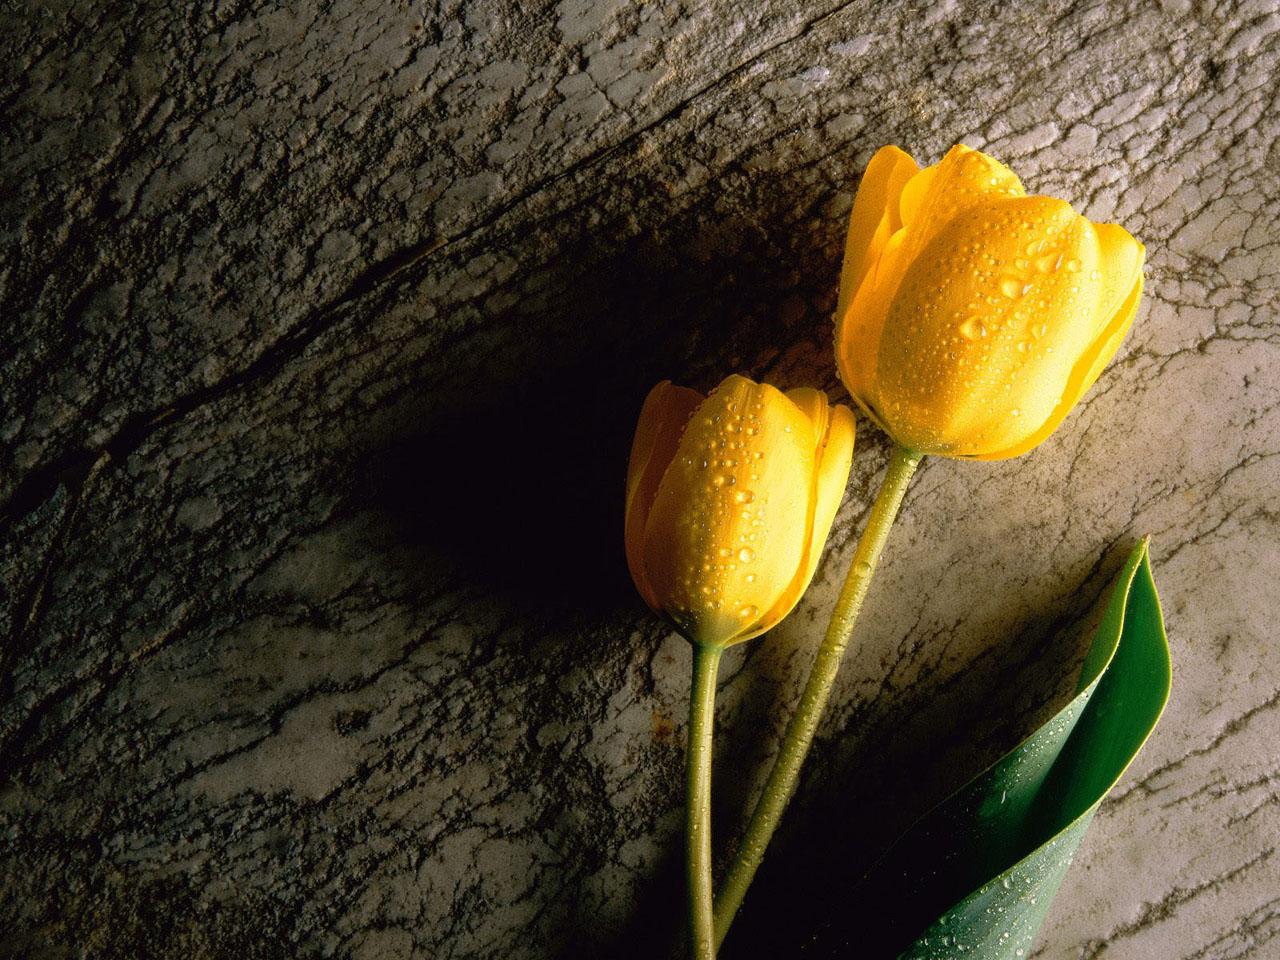 Flower Wallpaper Hd Yellow